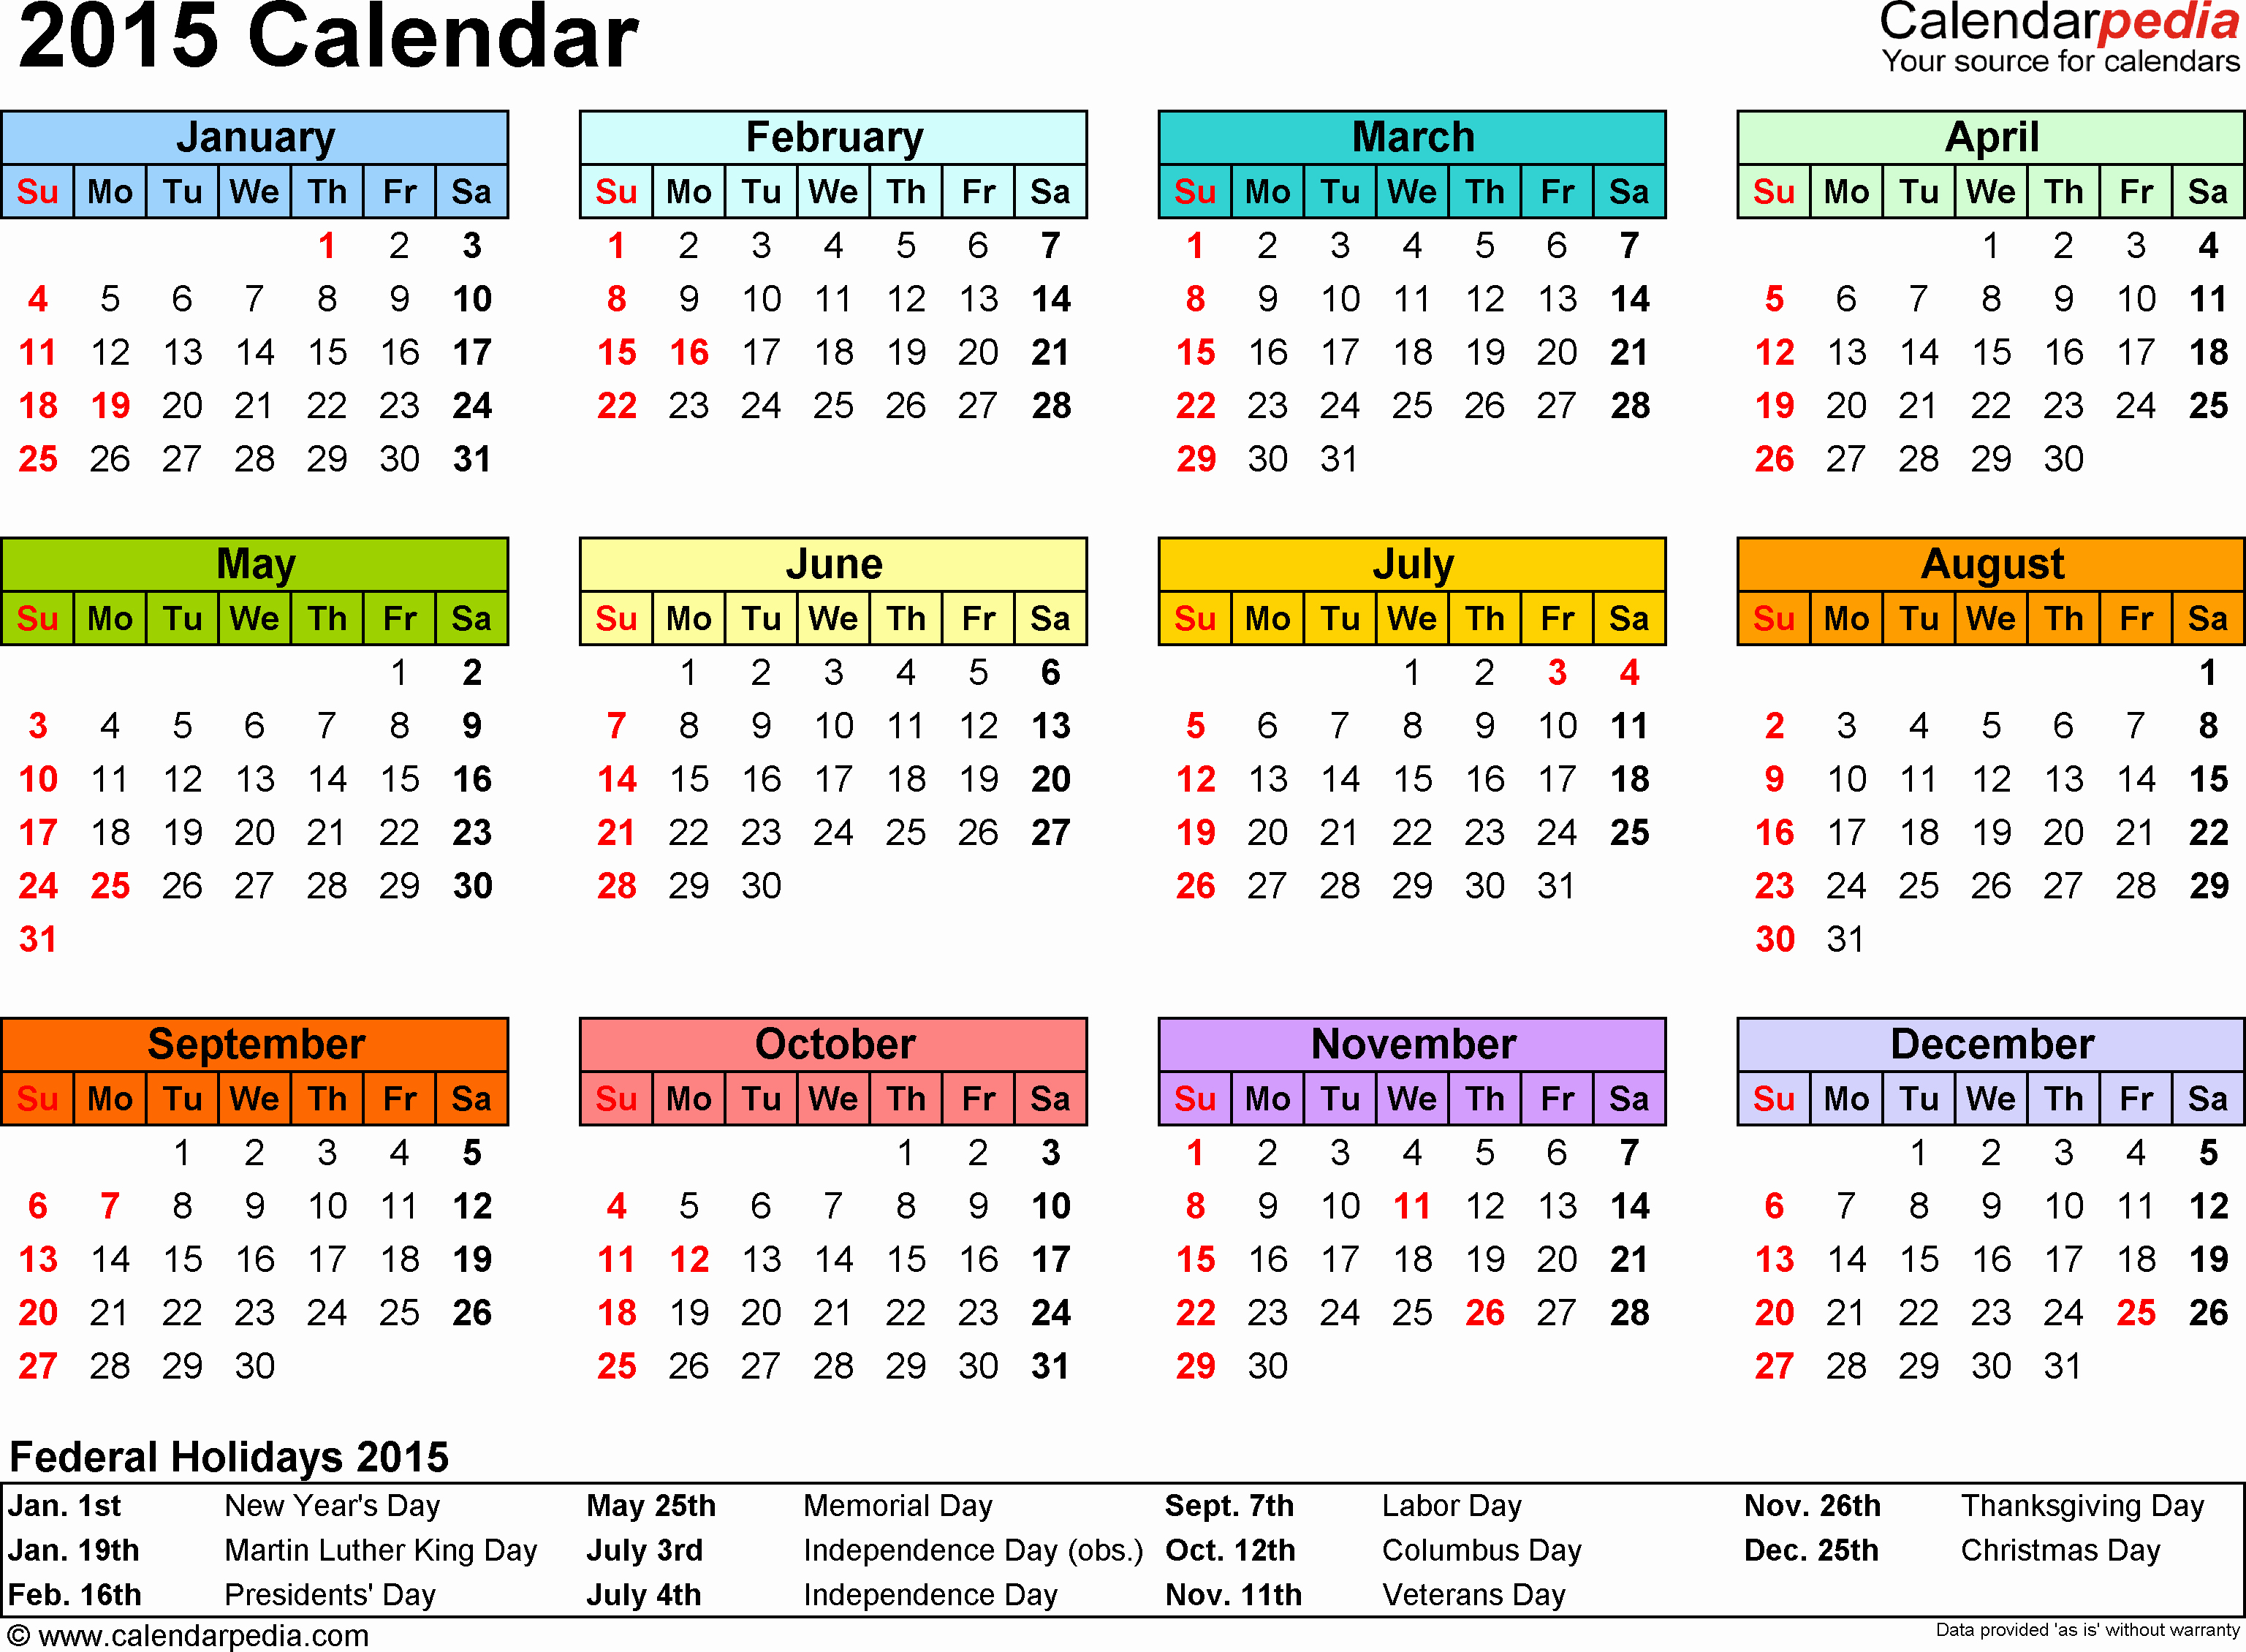 2015 Yearly Calendar Printable Landscape Unique 2015 Calendar Pdf 16 Free Printable Calendar Templates